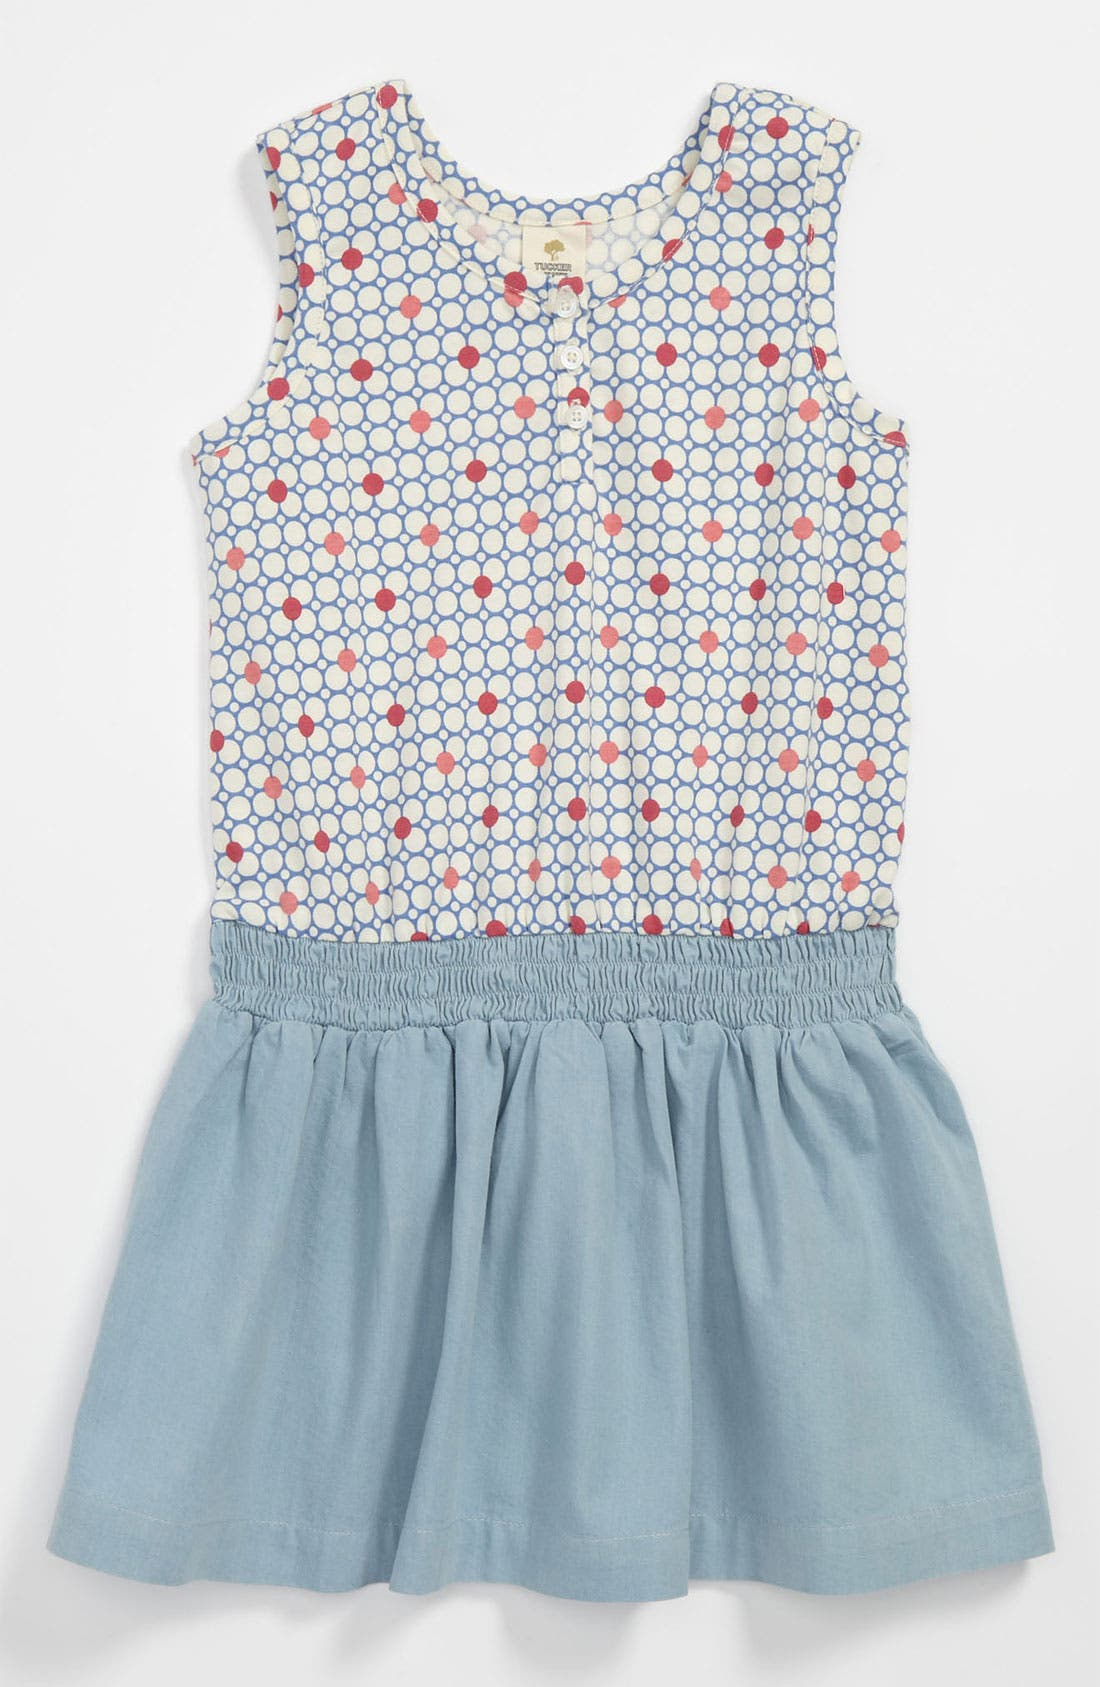 Alternate Image 1 Selected - Tucker + Tate 'Julia' Knit Dress (Little Girls)